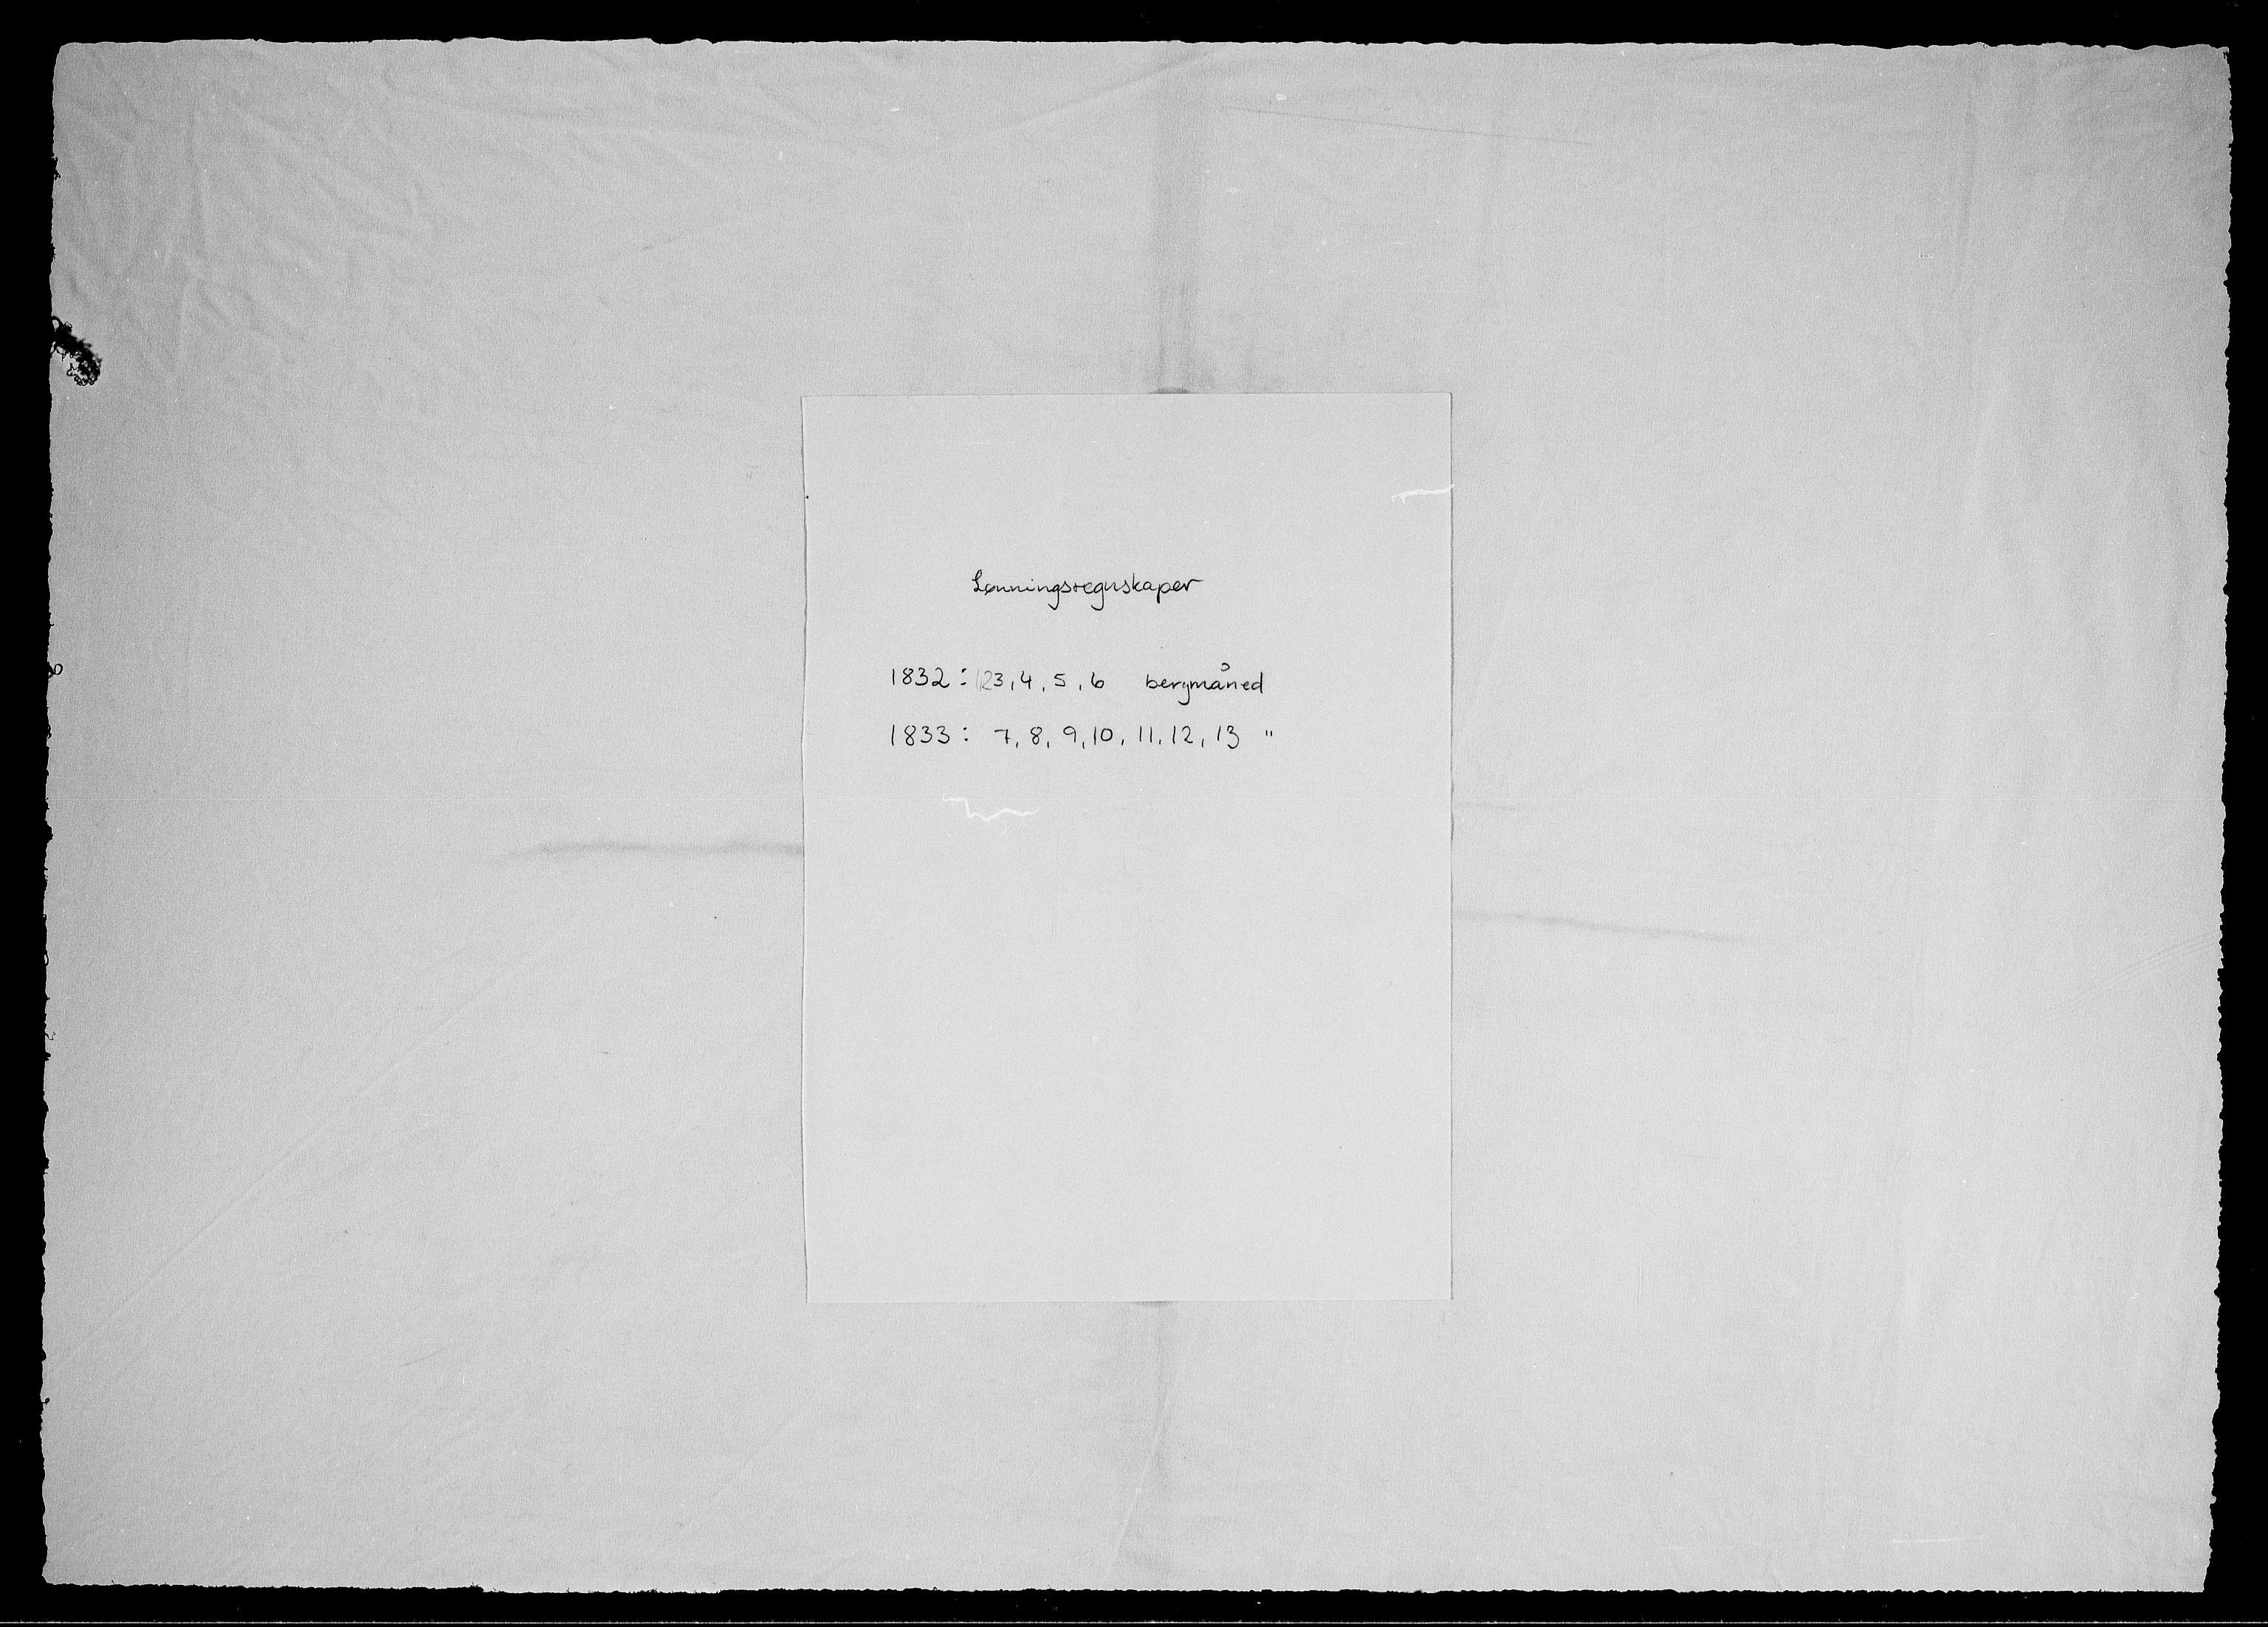 RA, Modums Blaafarveværk, G/Gd/Gdd/L0273, 1832-1833, s. 2